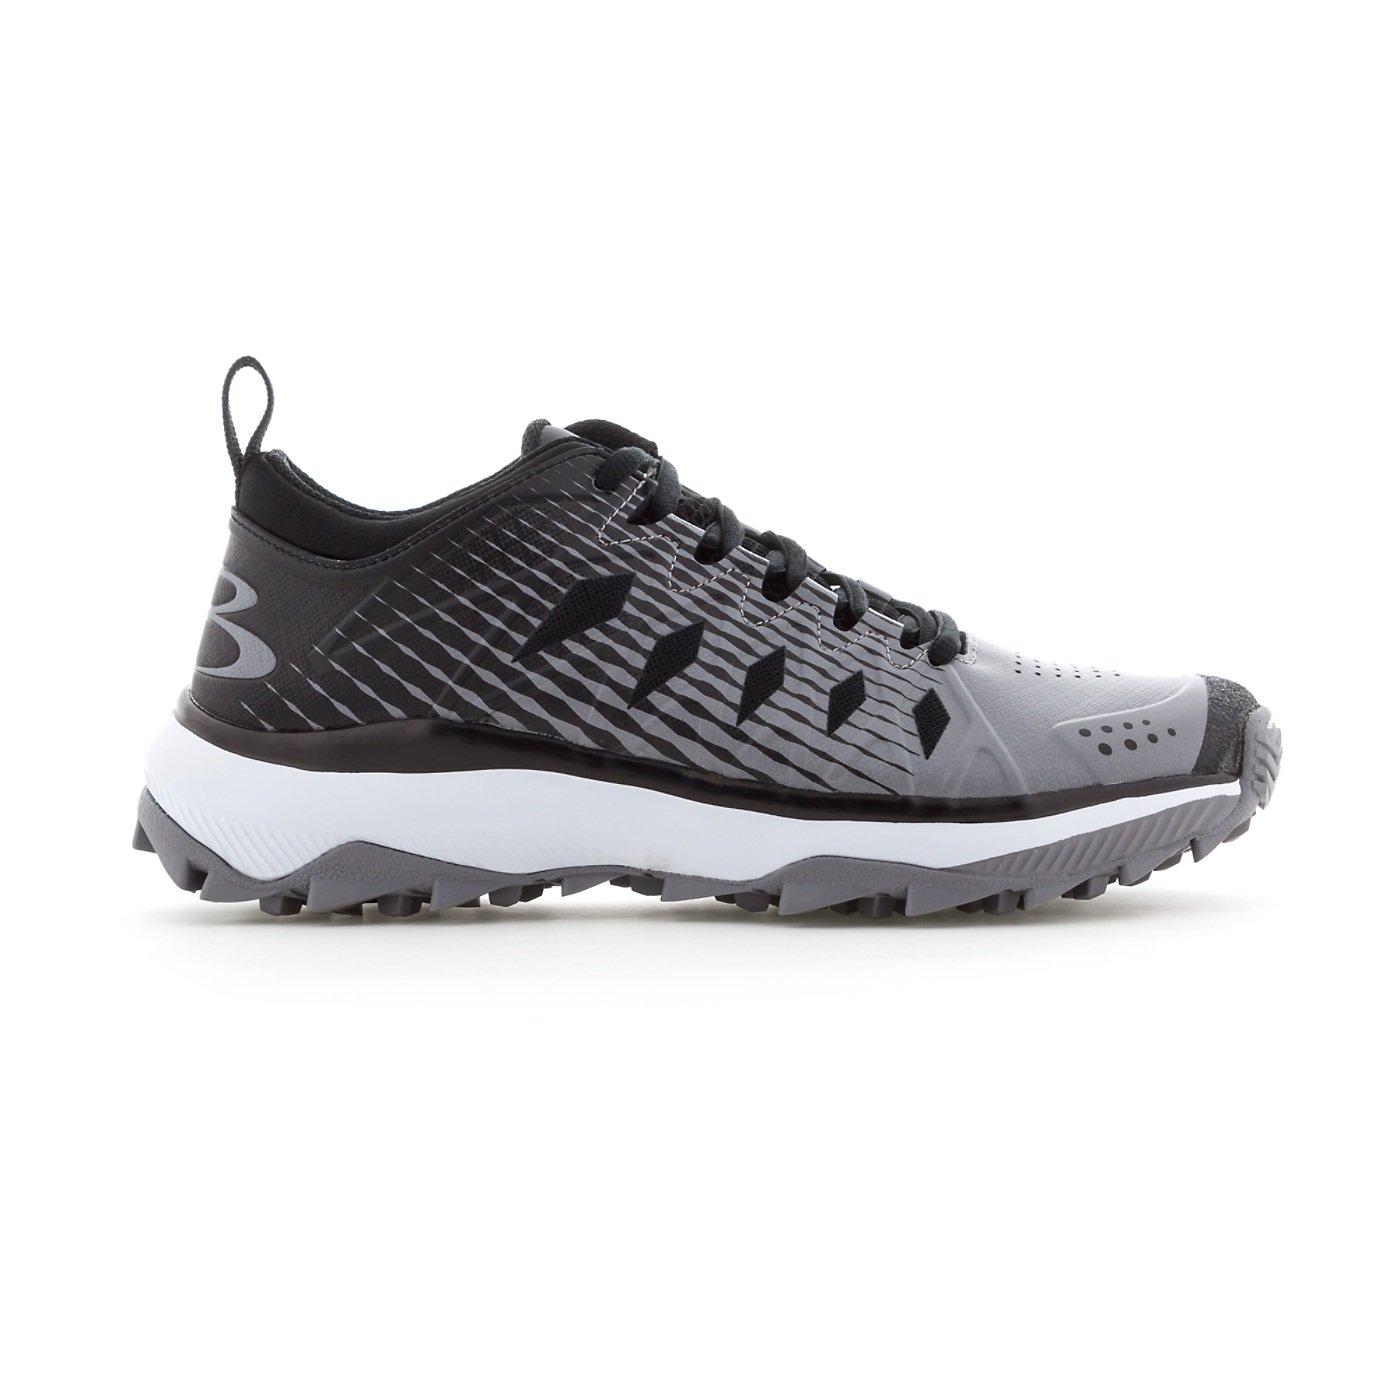 Boombah Women's Squadron Turf Shoes - 14 Color Options - Multiple Sizes B079K68YDT 6|Black/Gray